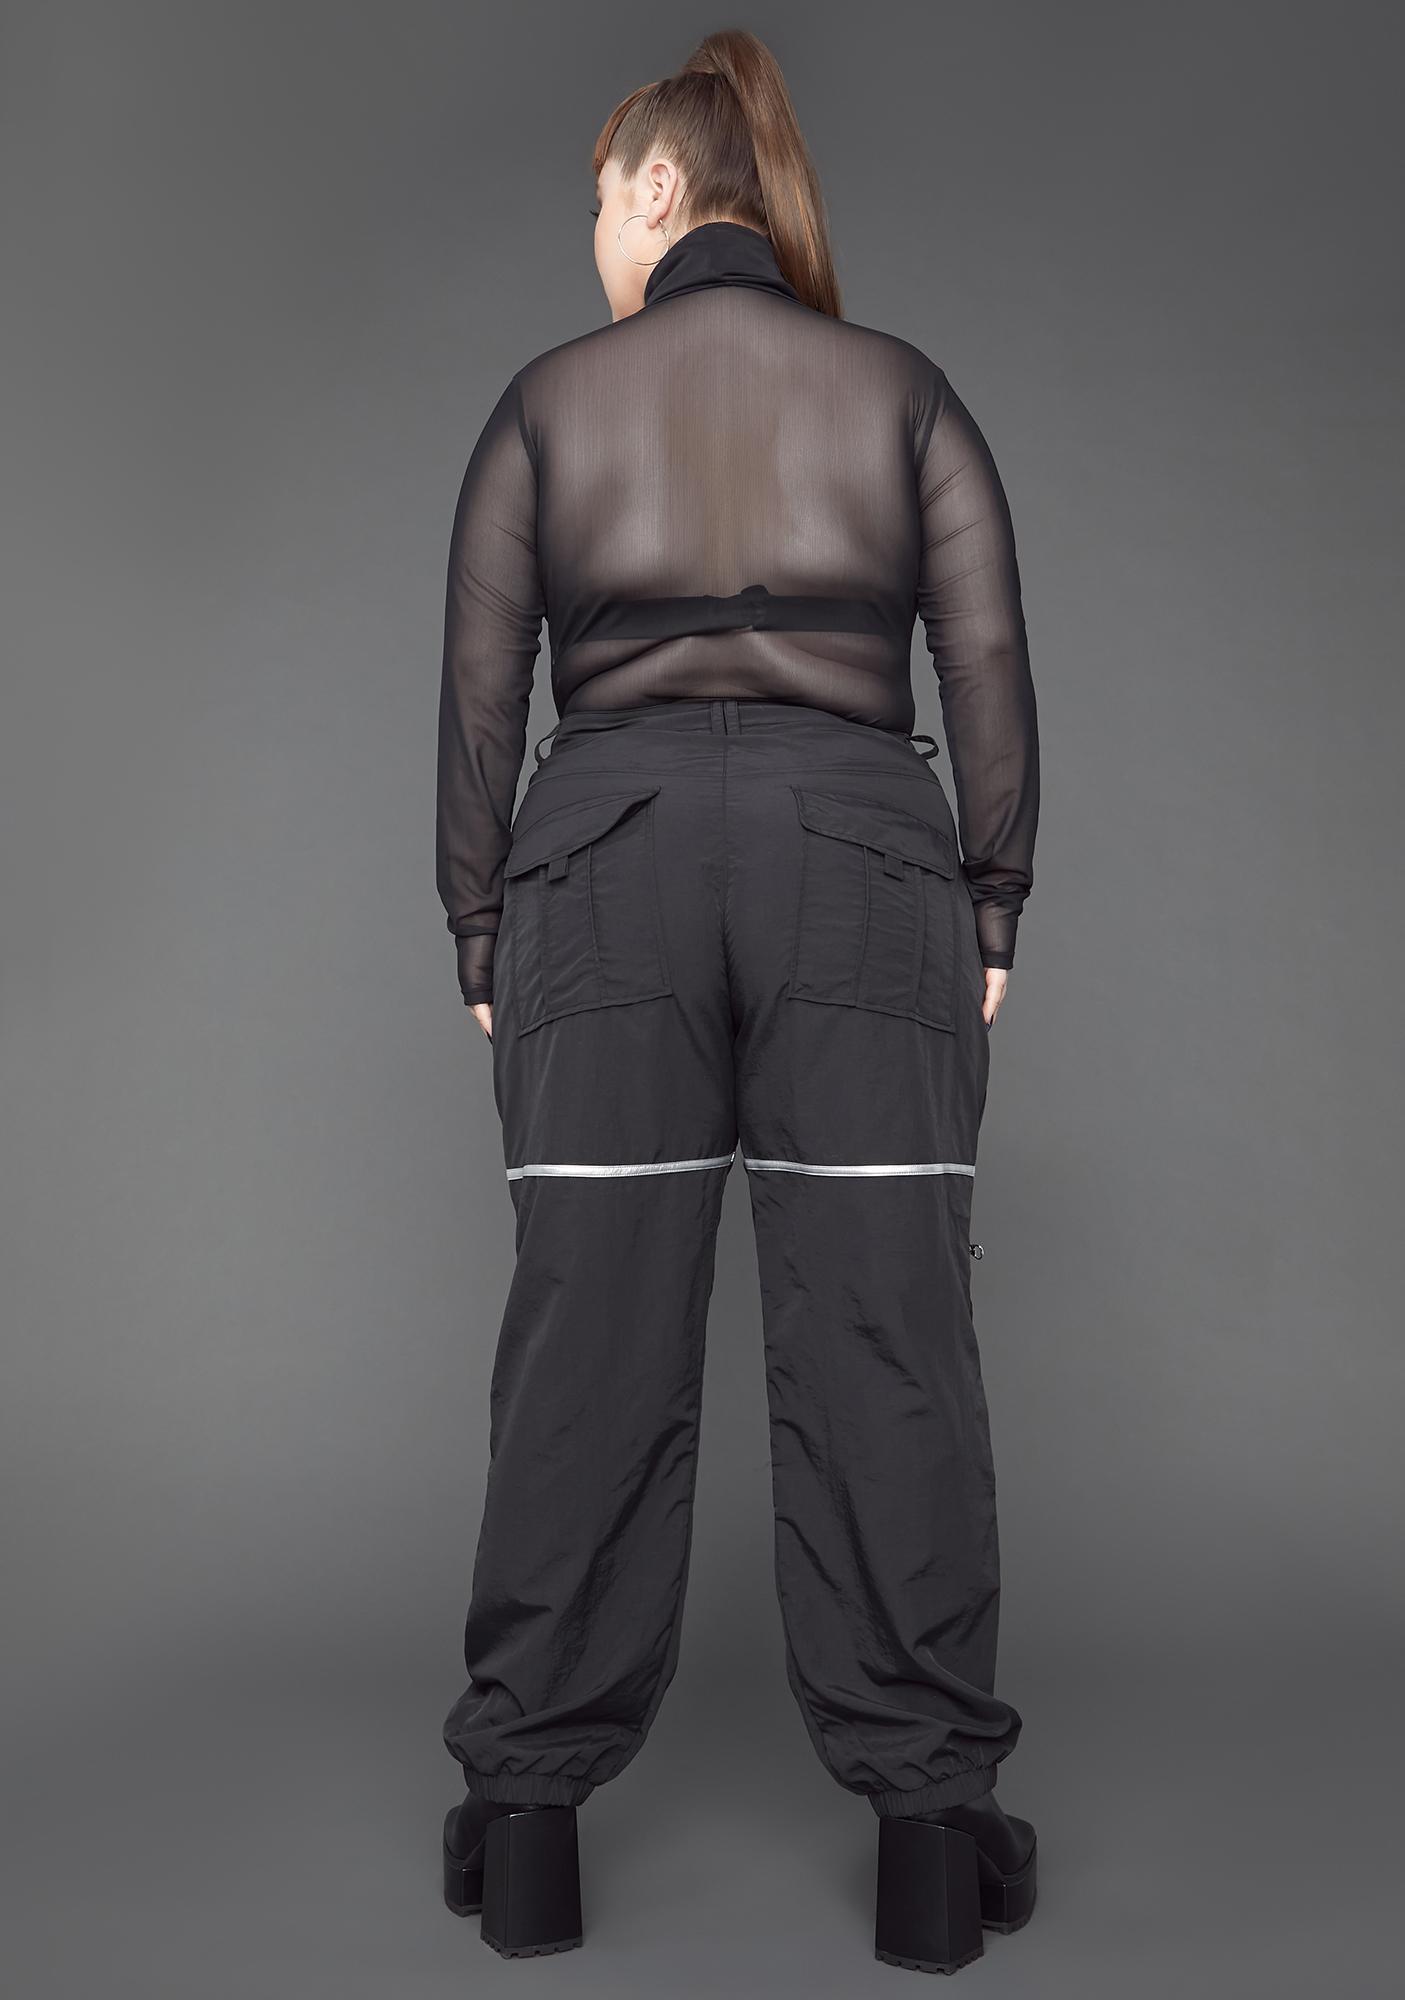 Poster Grl You Make 'Em Sweat Nylon Cargo Pants